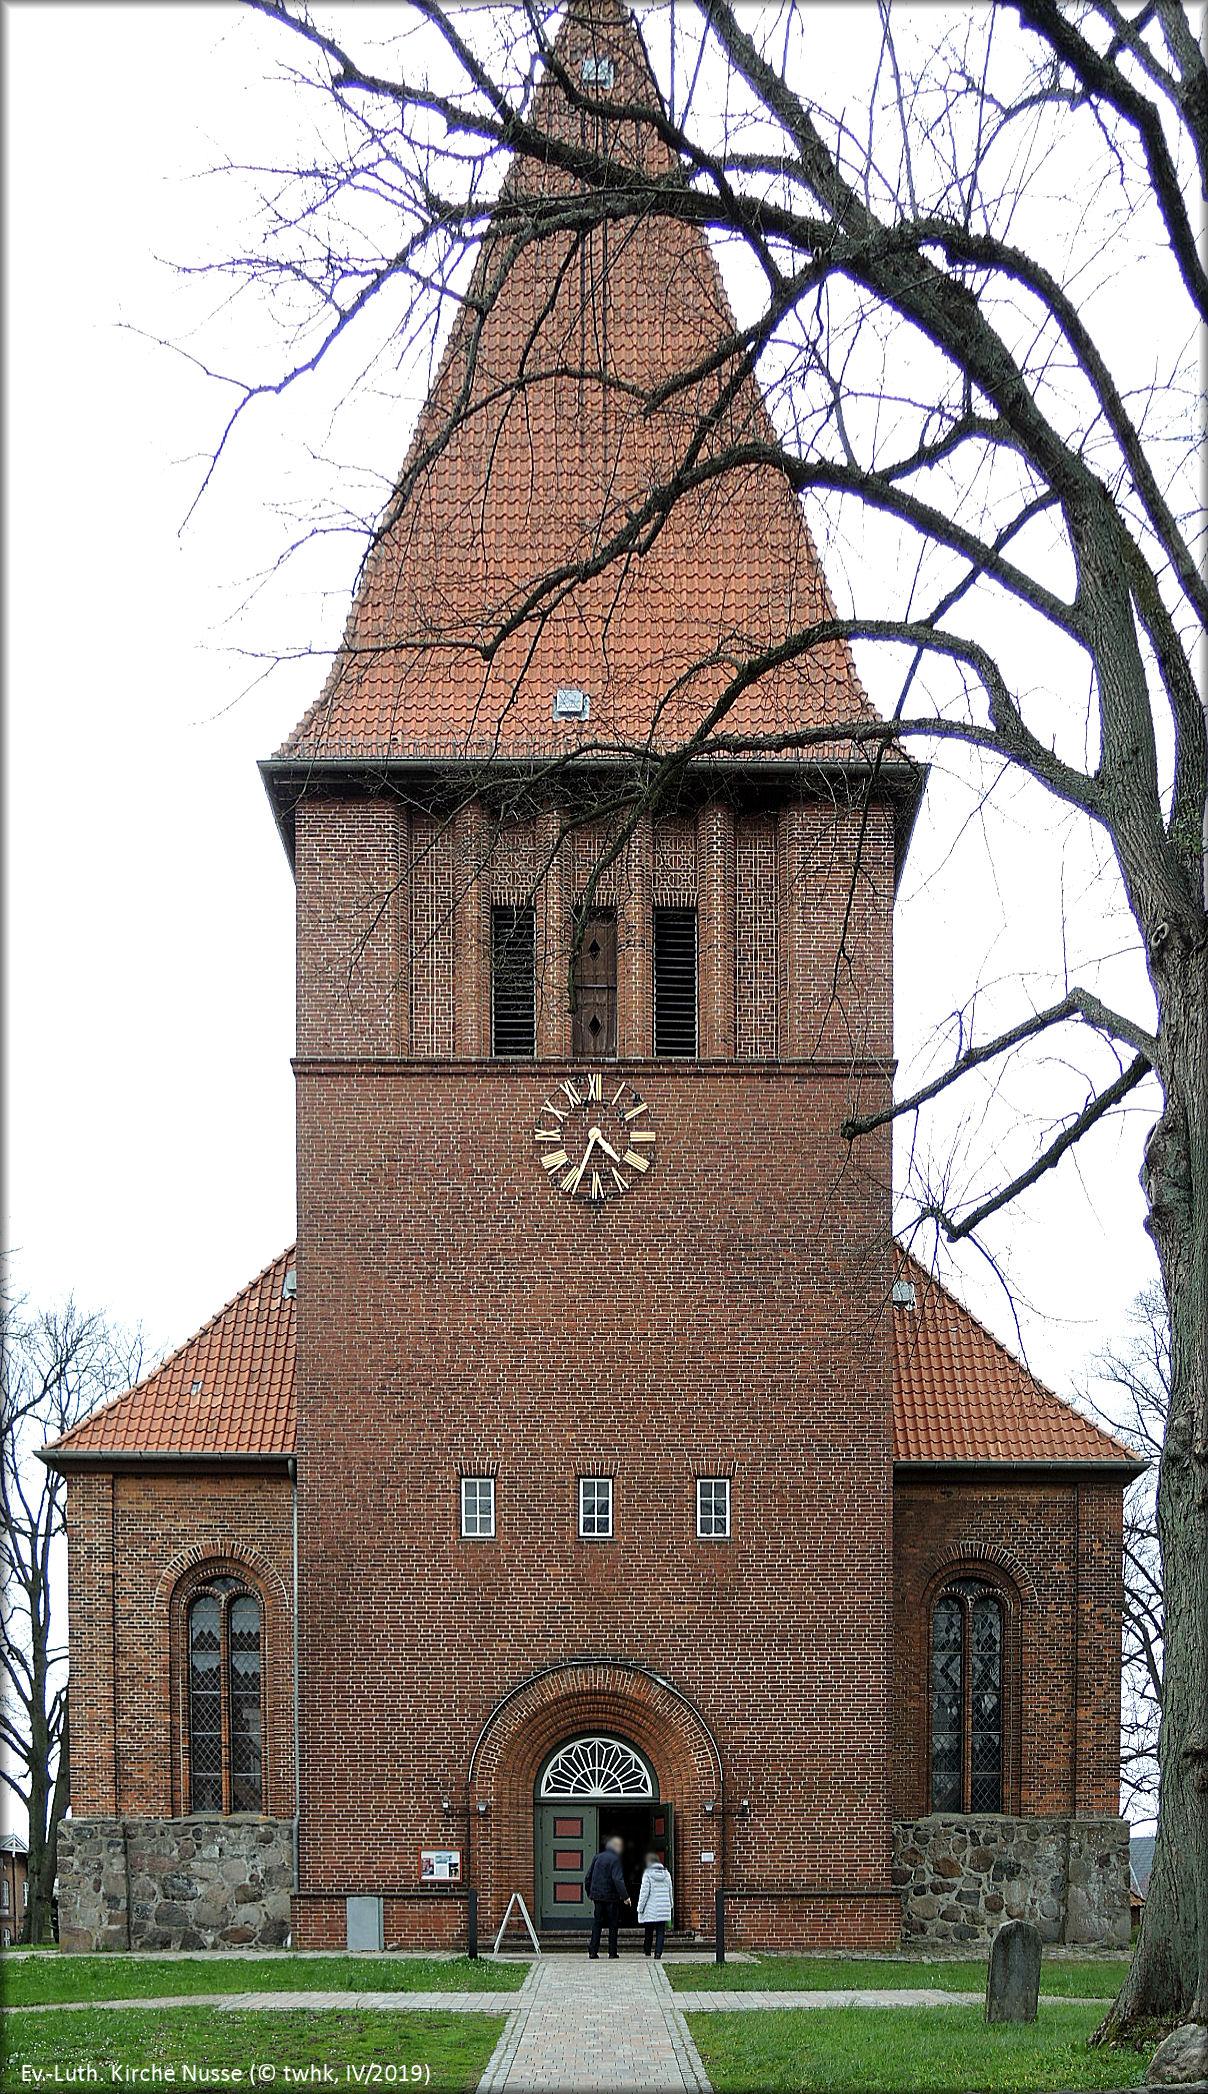 Kirche Nusse